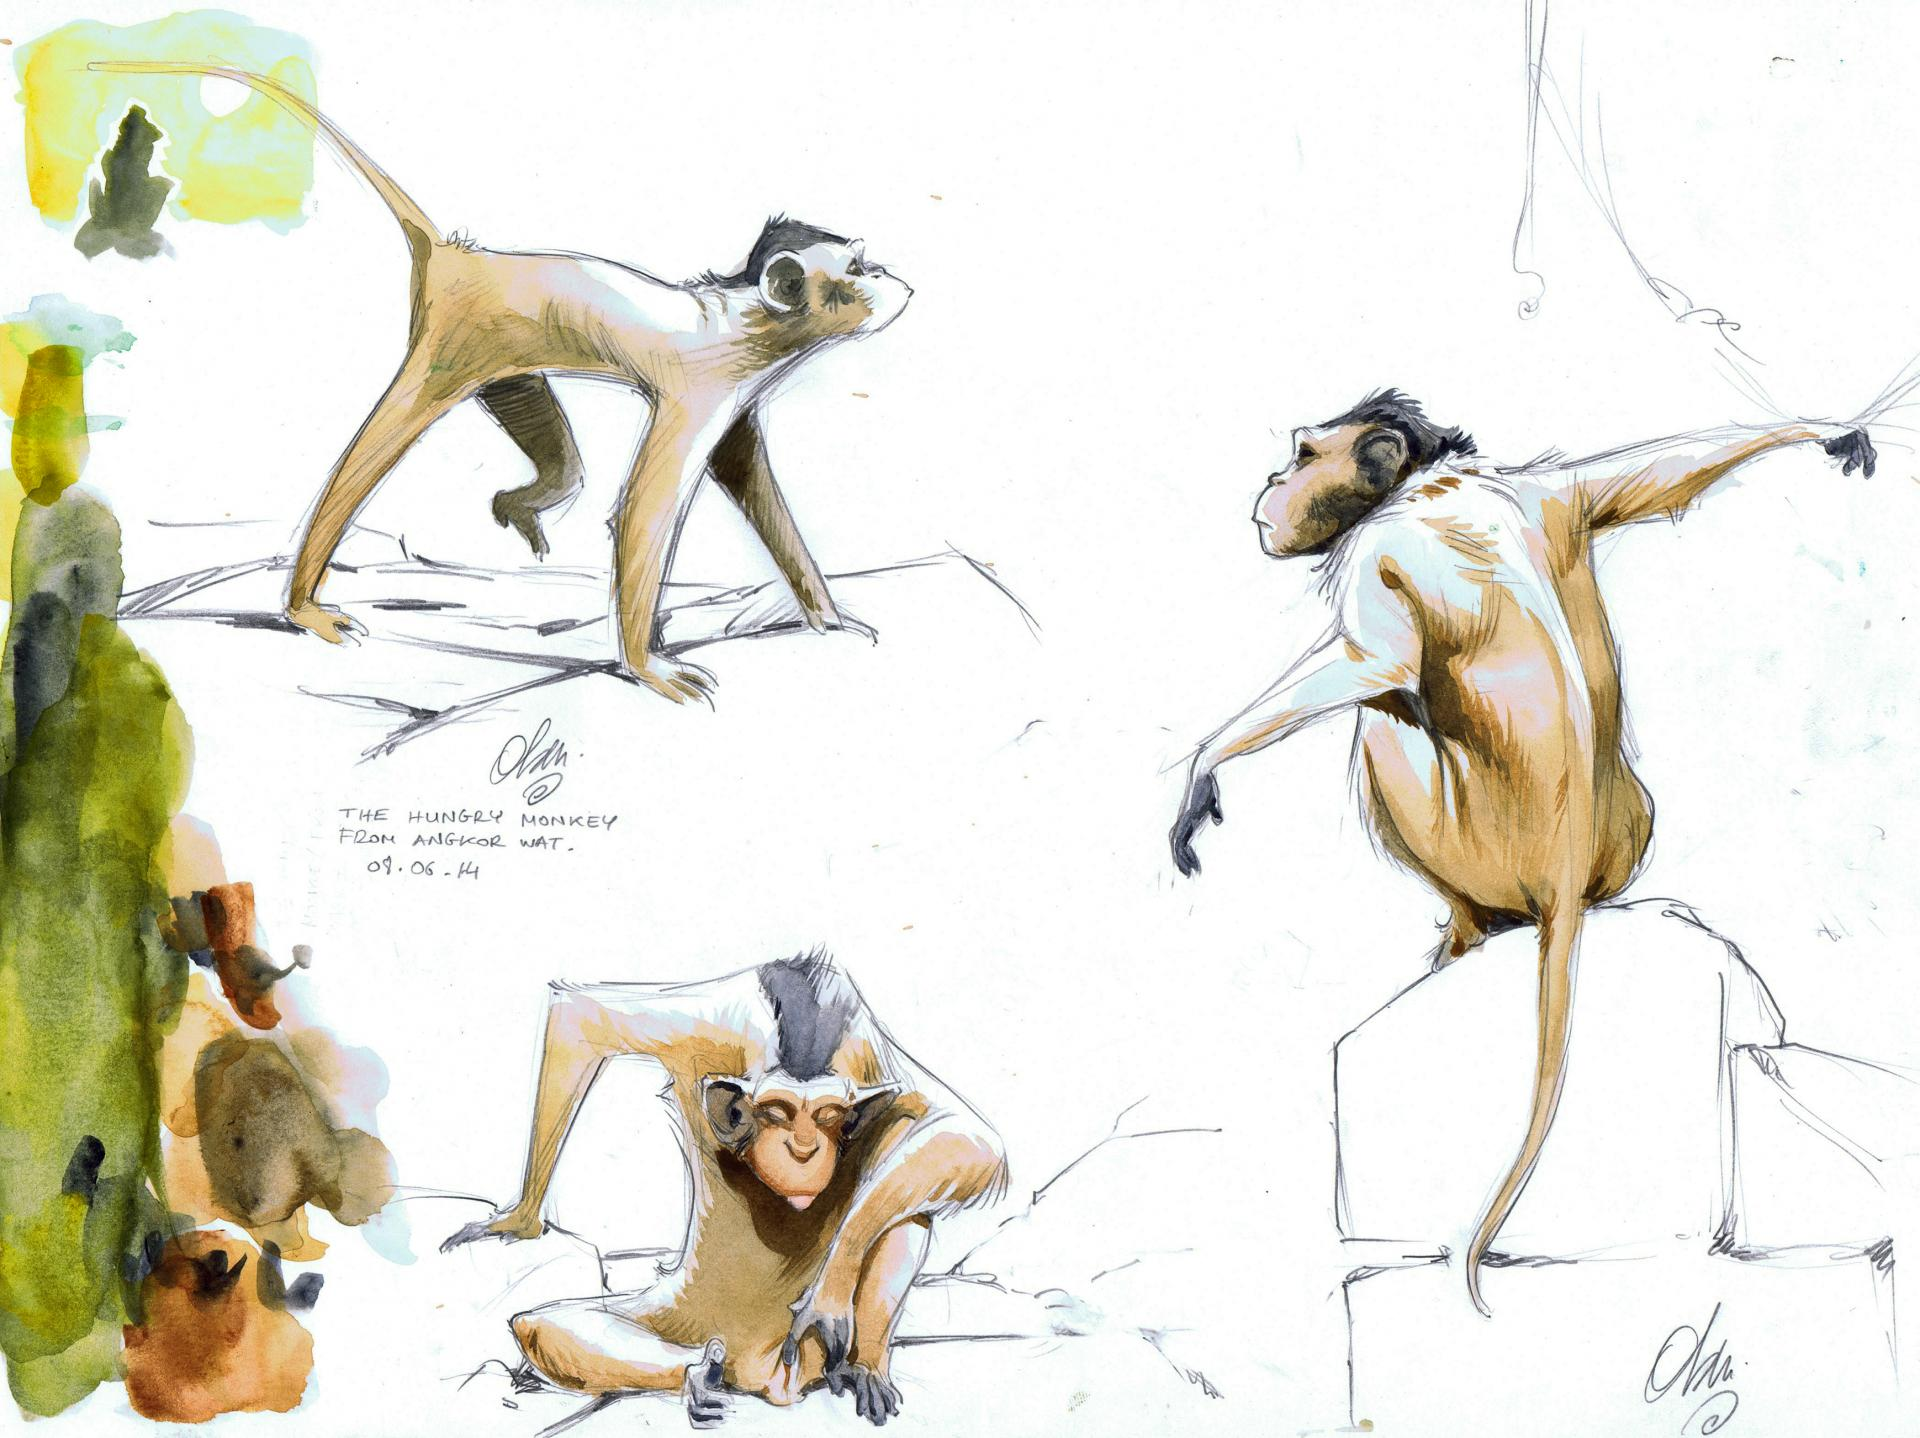 Angkor's Monkeys